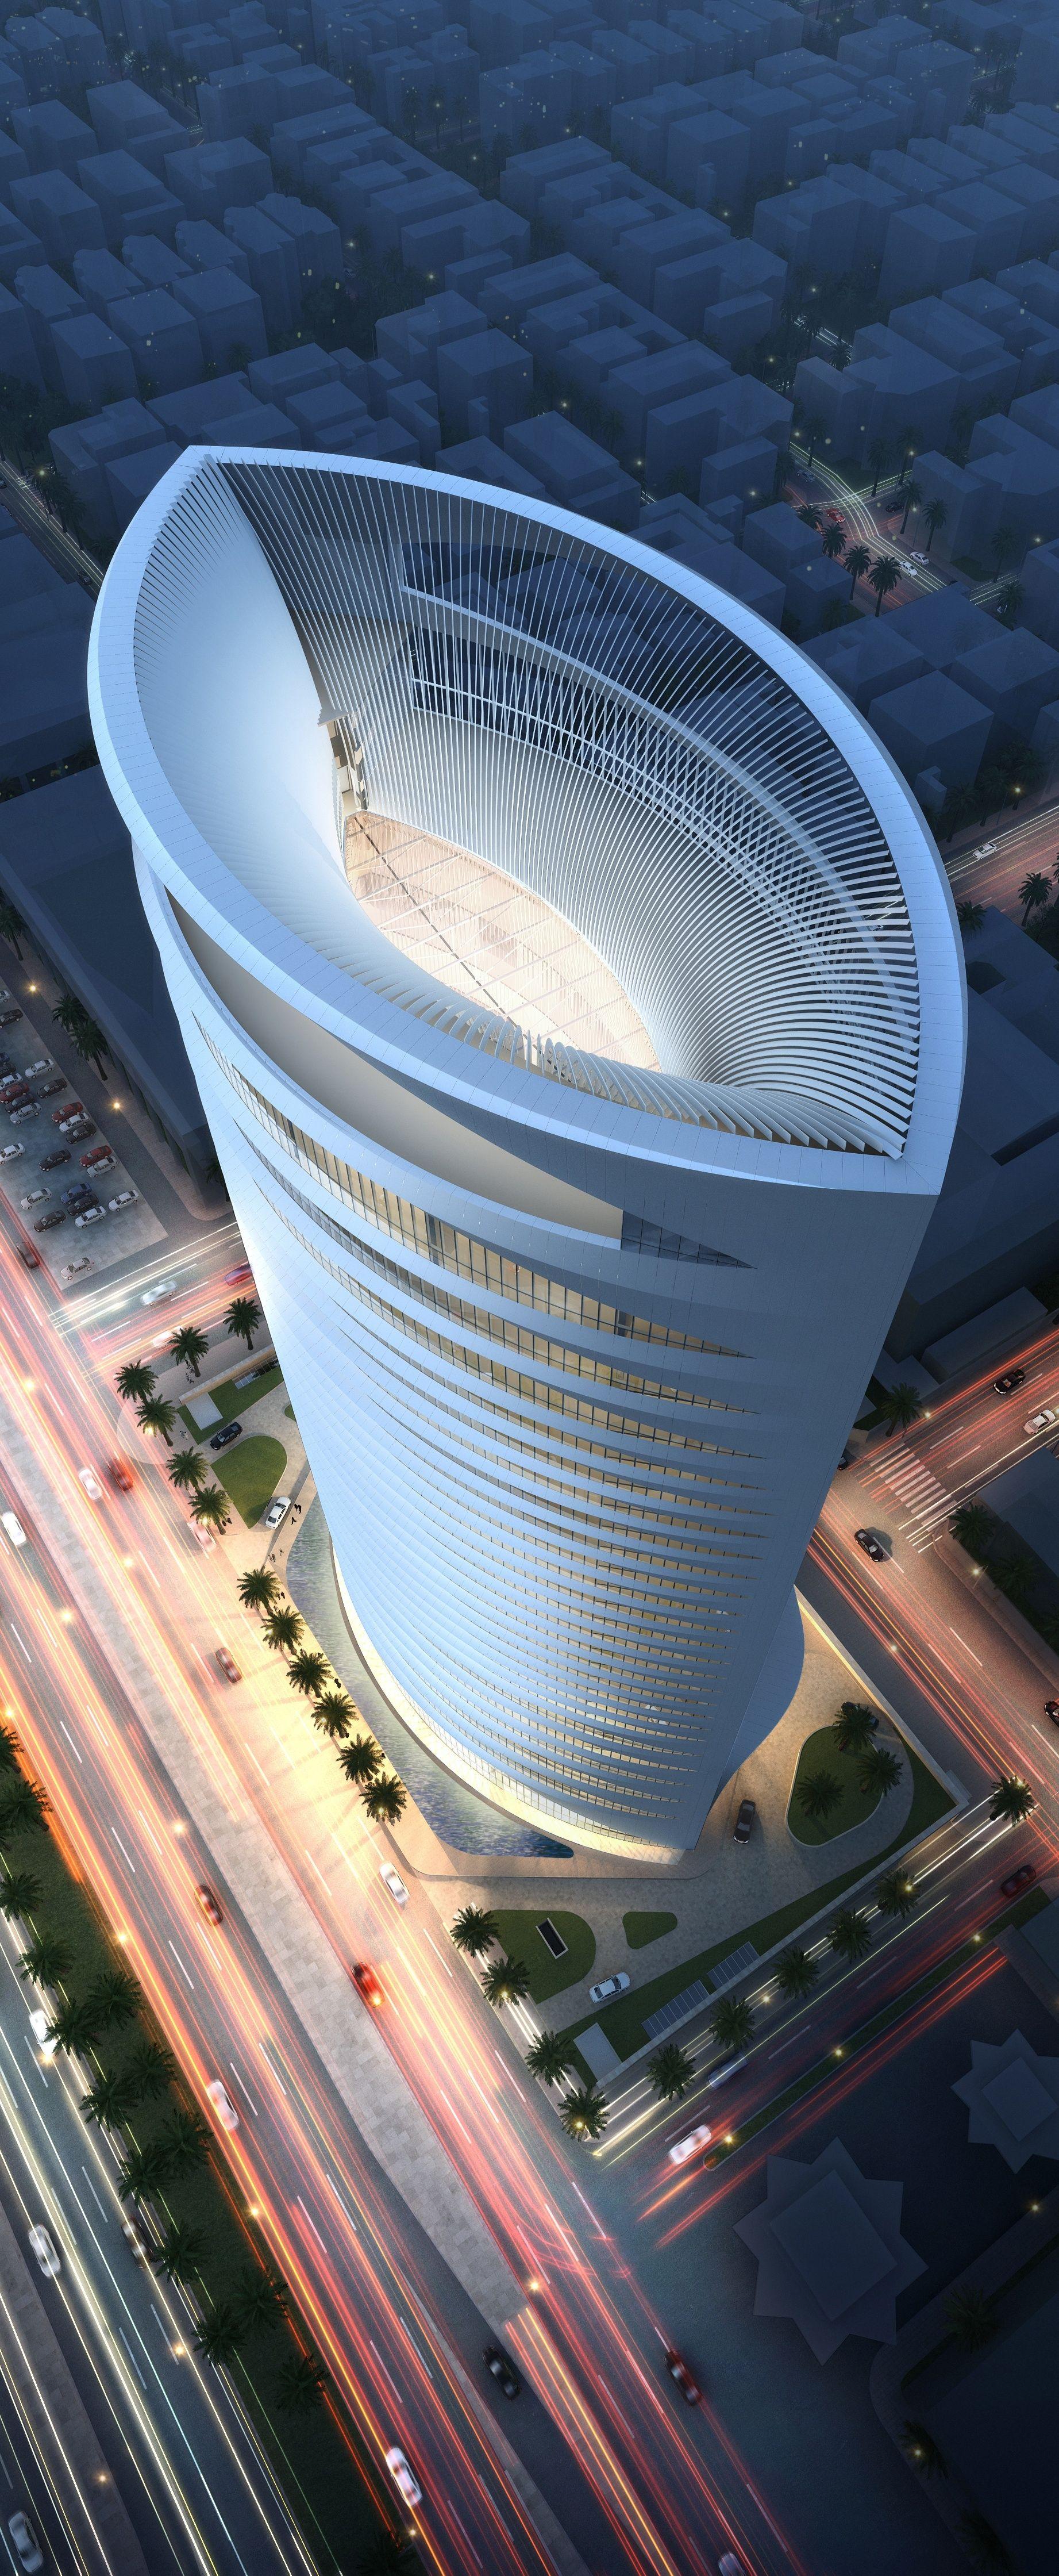 Park Hyatt Riyadh Saudi Arabia Designed By Skidmore Owings Merrill Amazing Architecture Architecture Building Futuristic Architecture